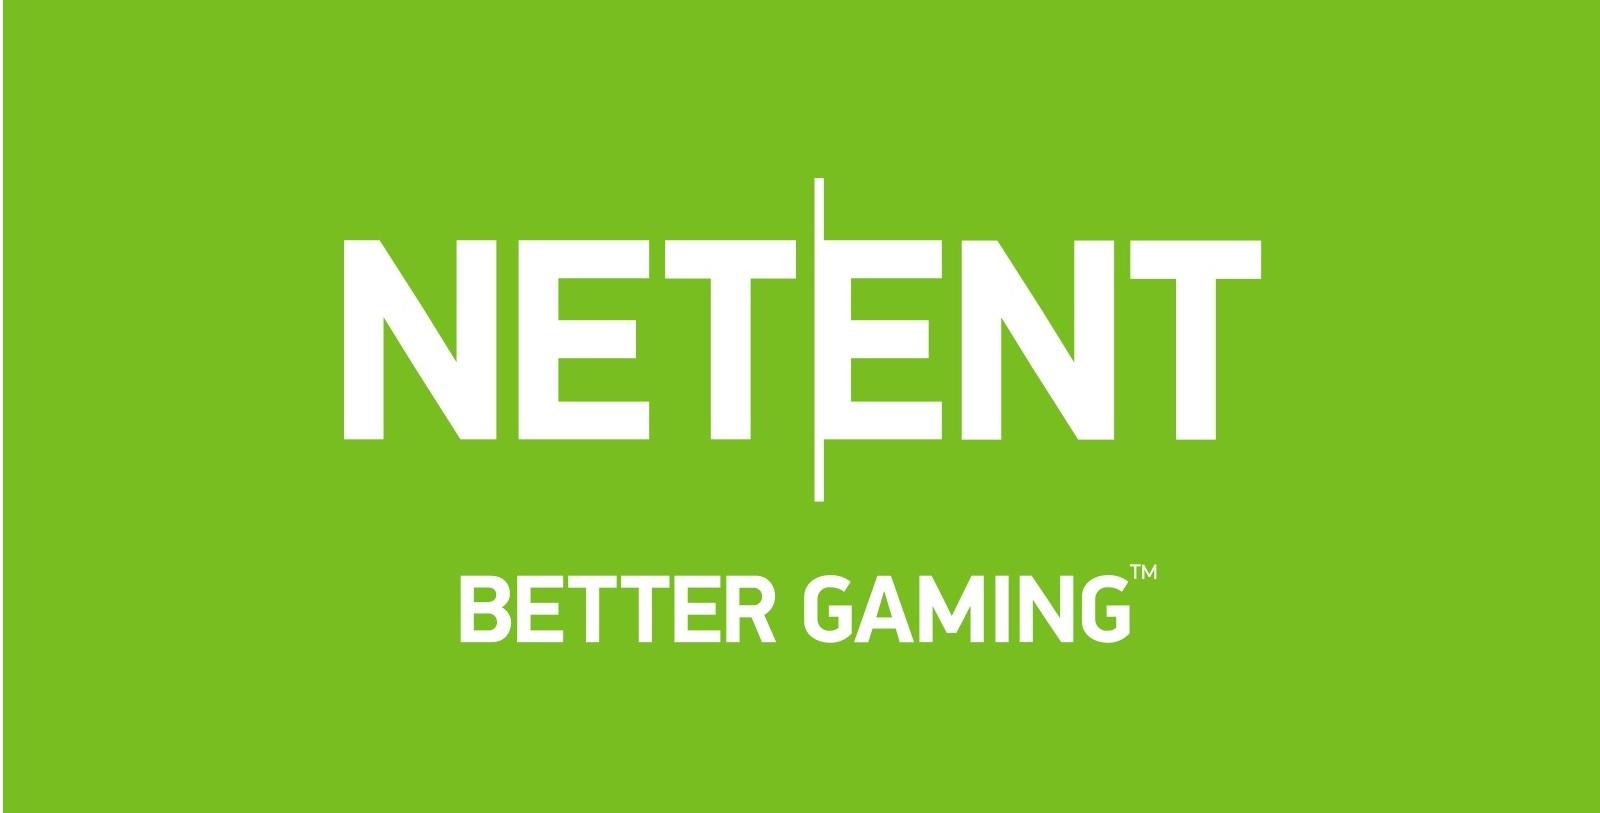 netent-logo-green